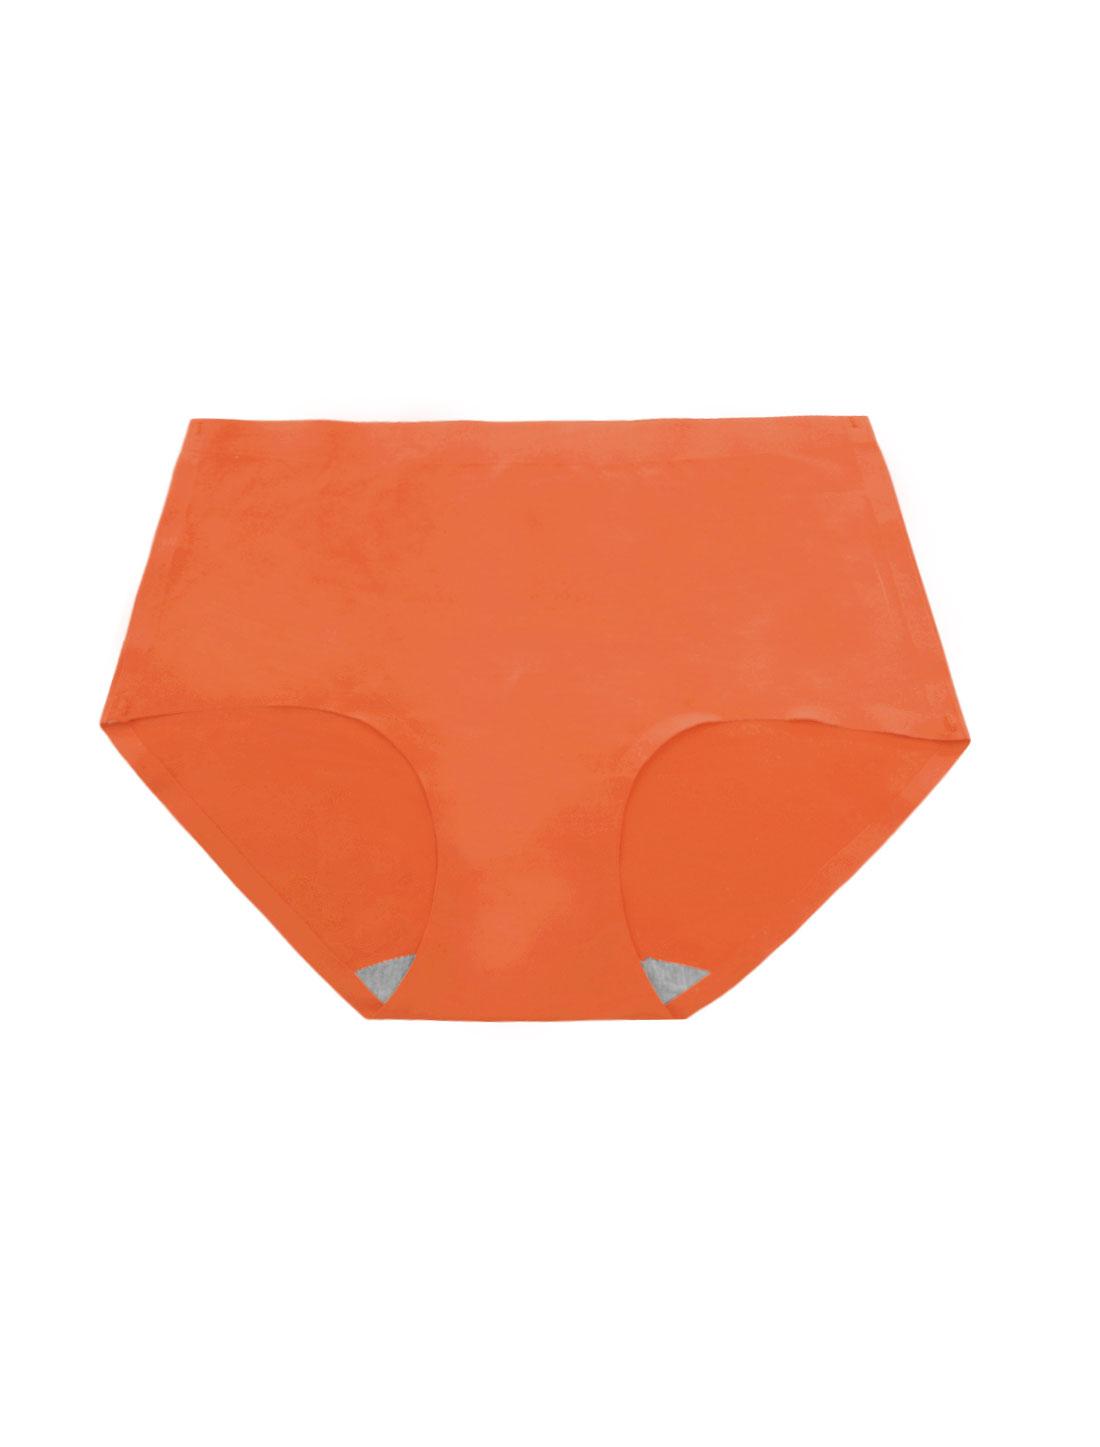 Women Mid Rise Elastic Waist Seamless Stretchy Panty Dark Orange XS